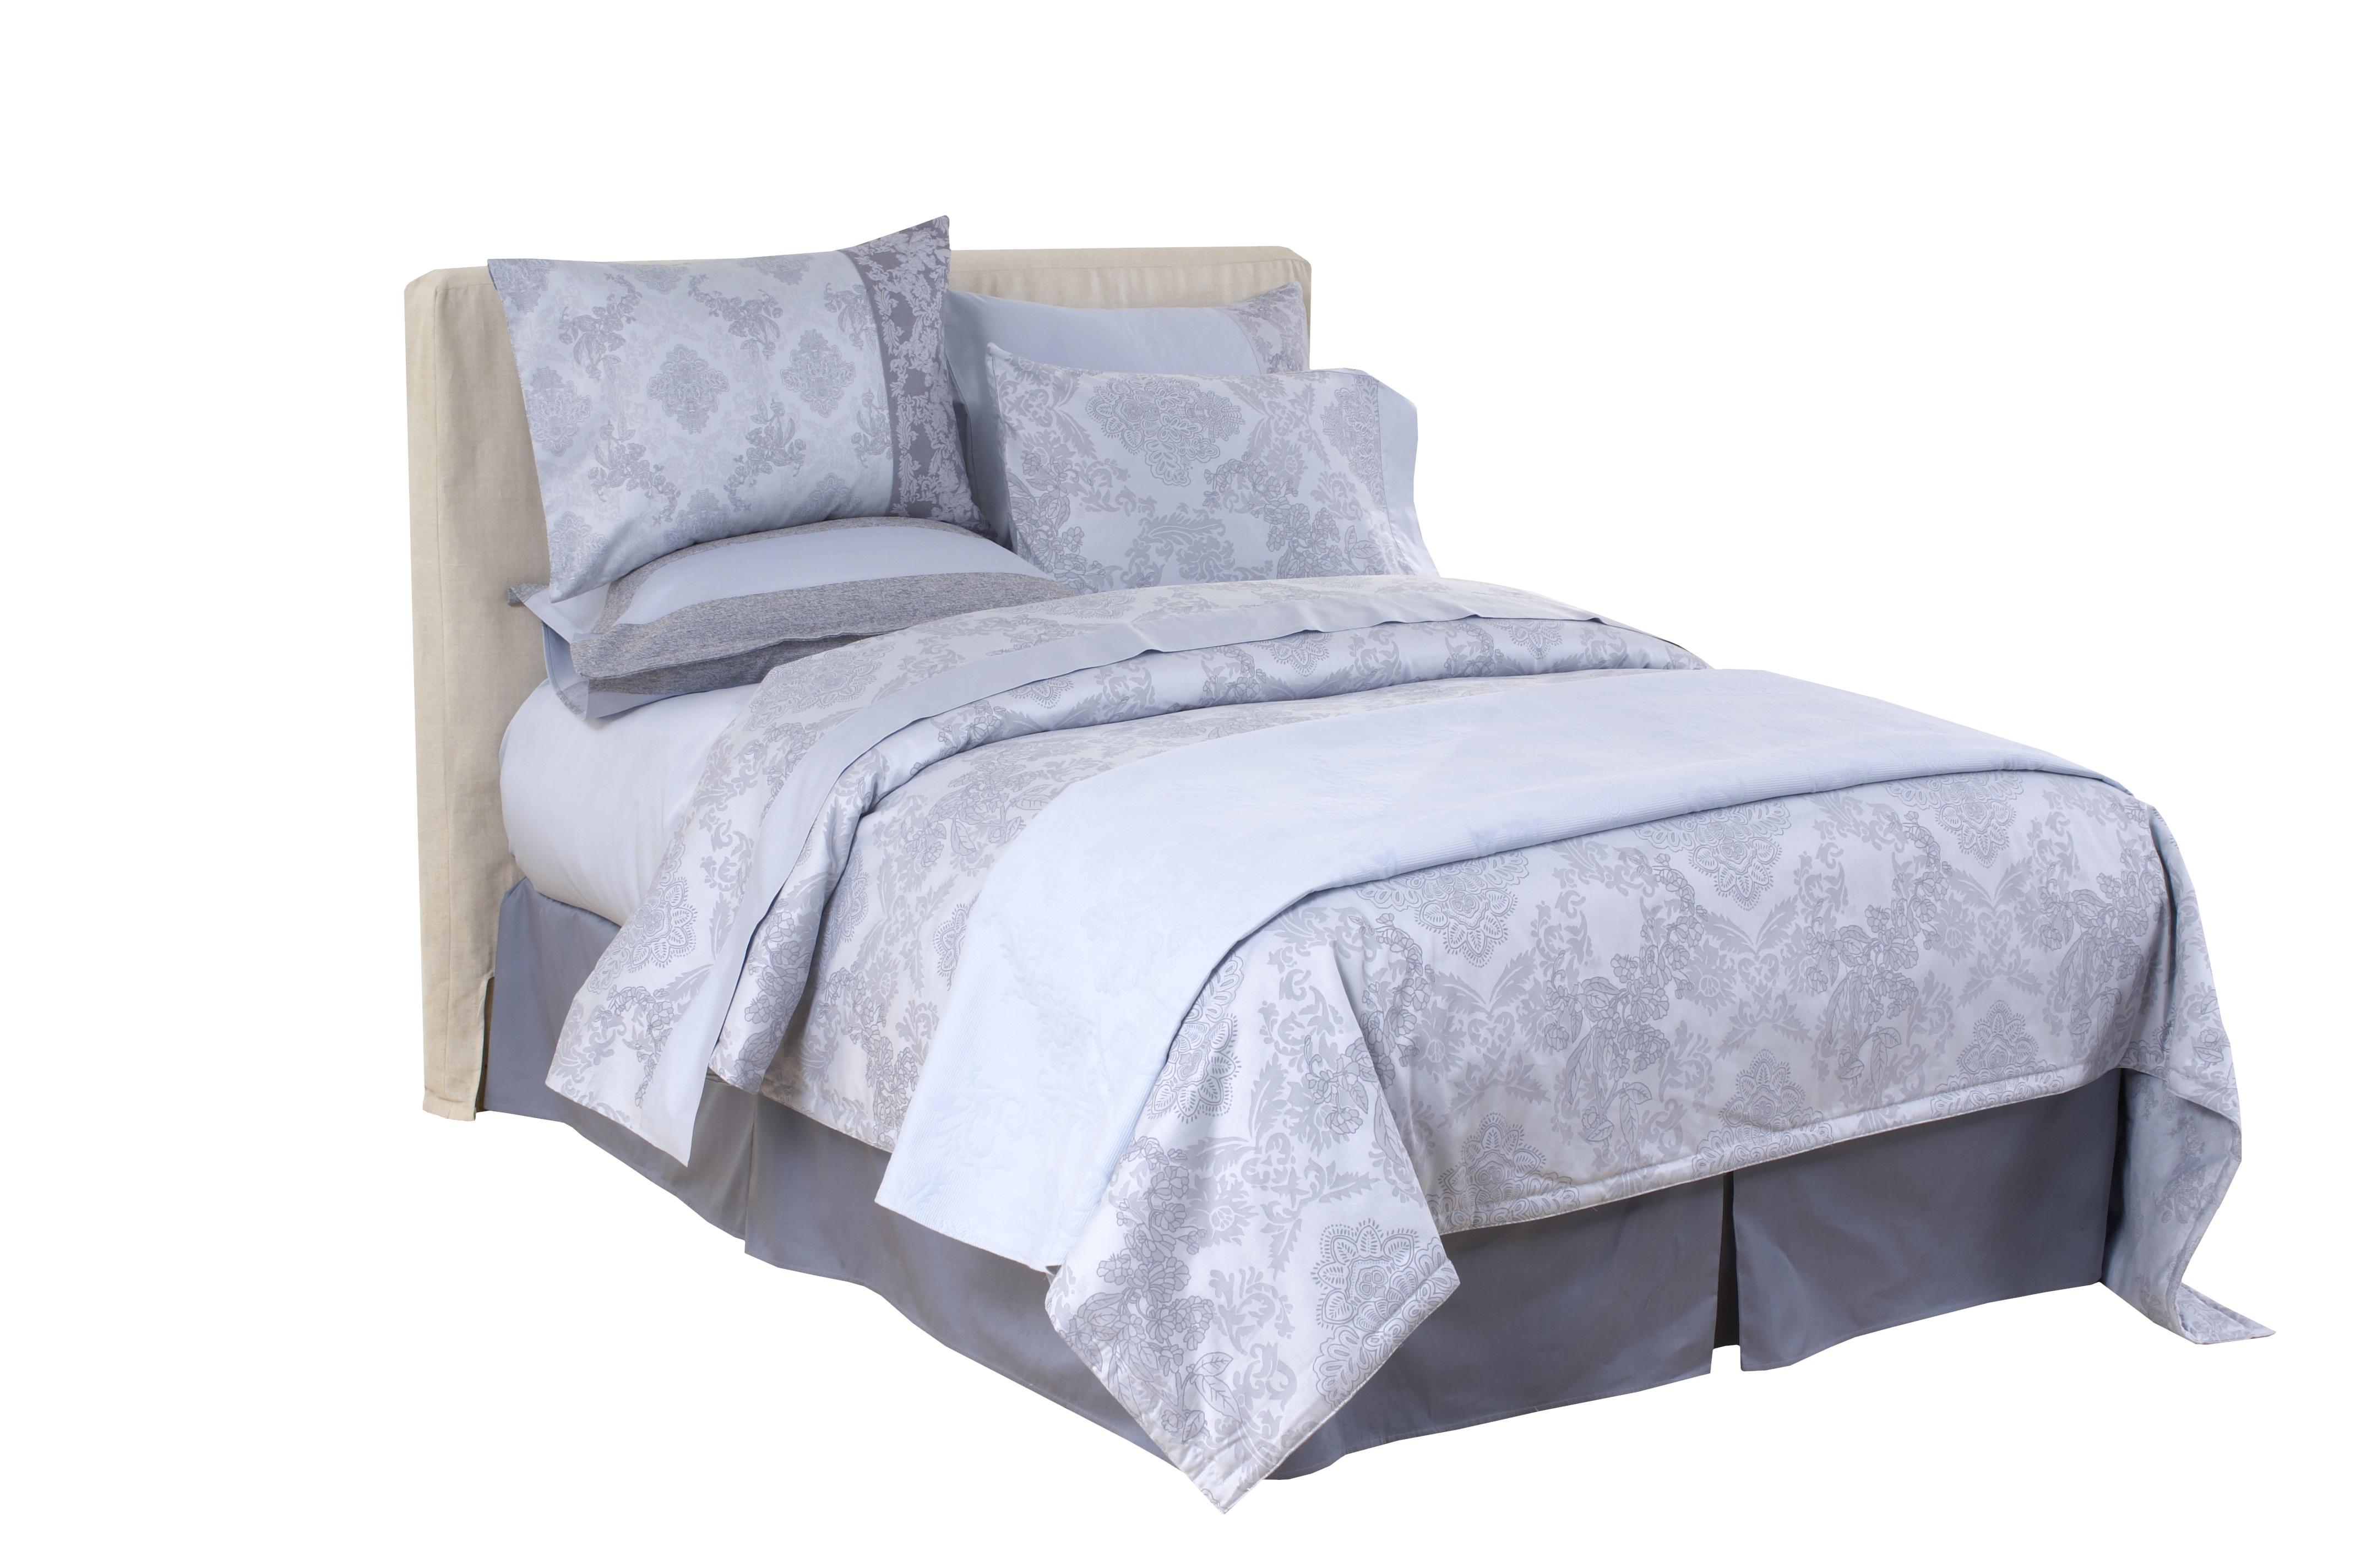 Custom Luxury Bedding Nyc Headboards Linens Sheets Jo Vin